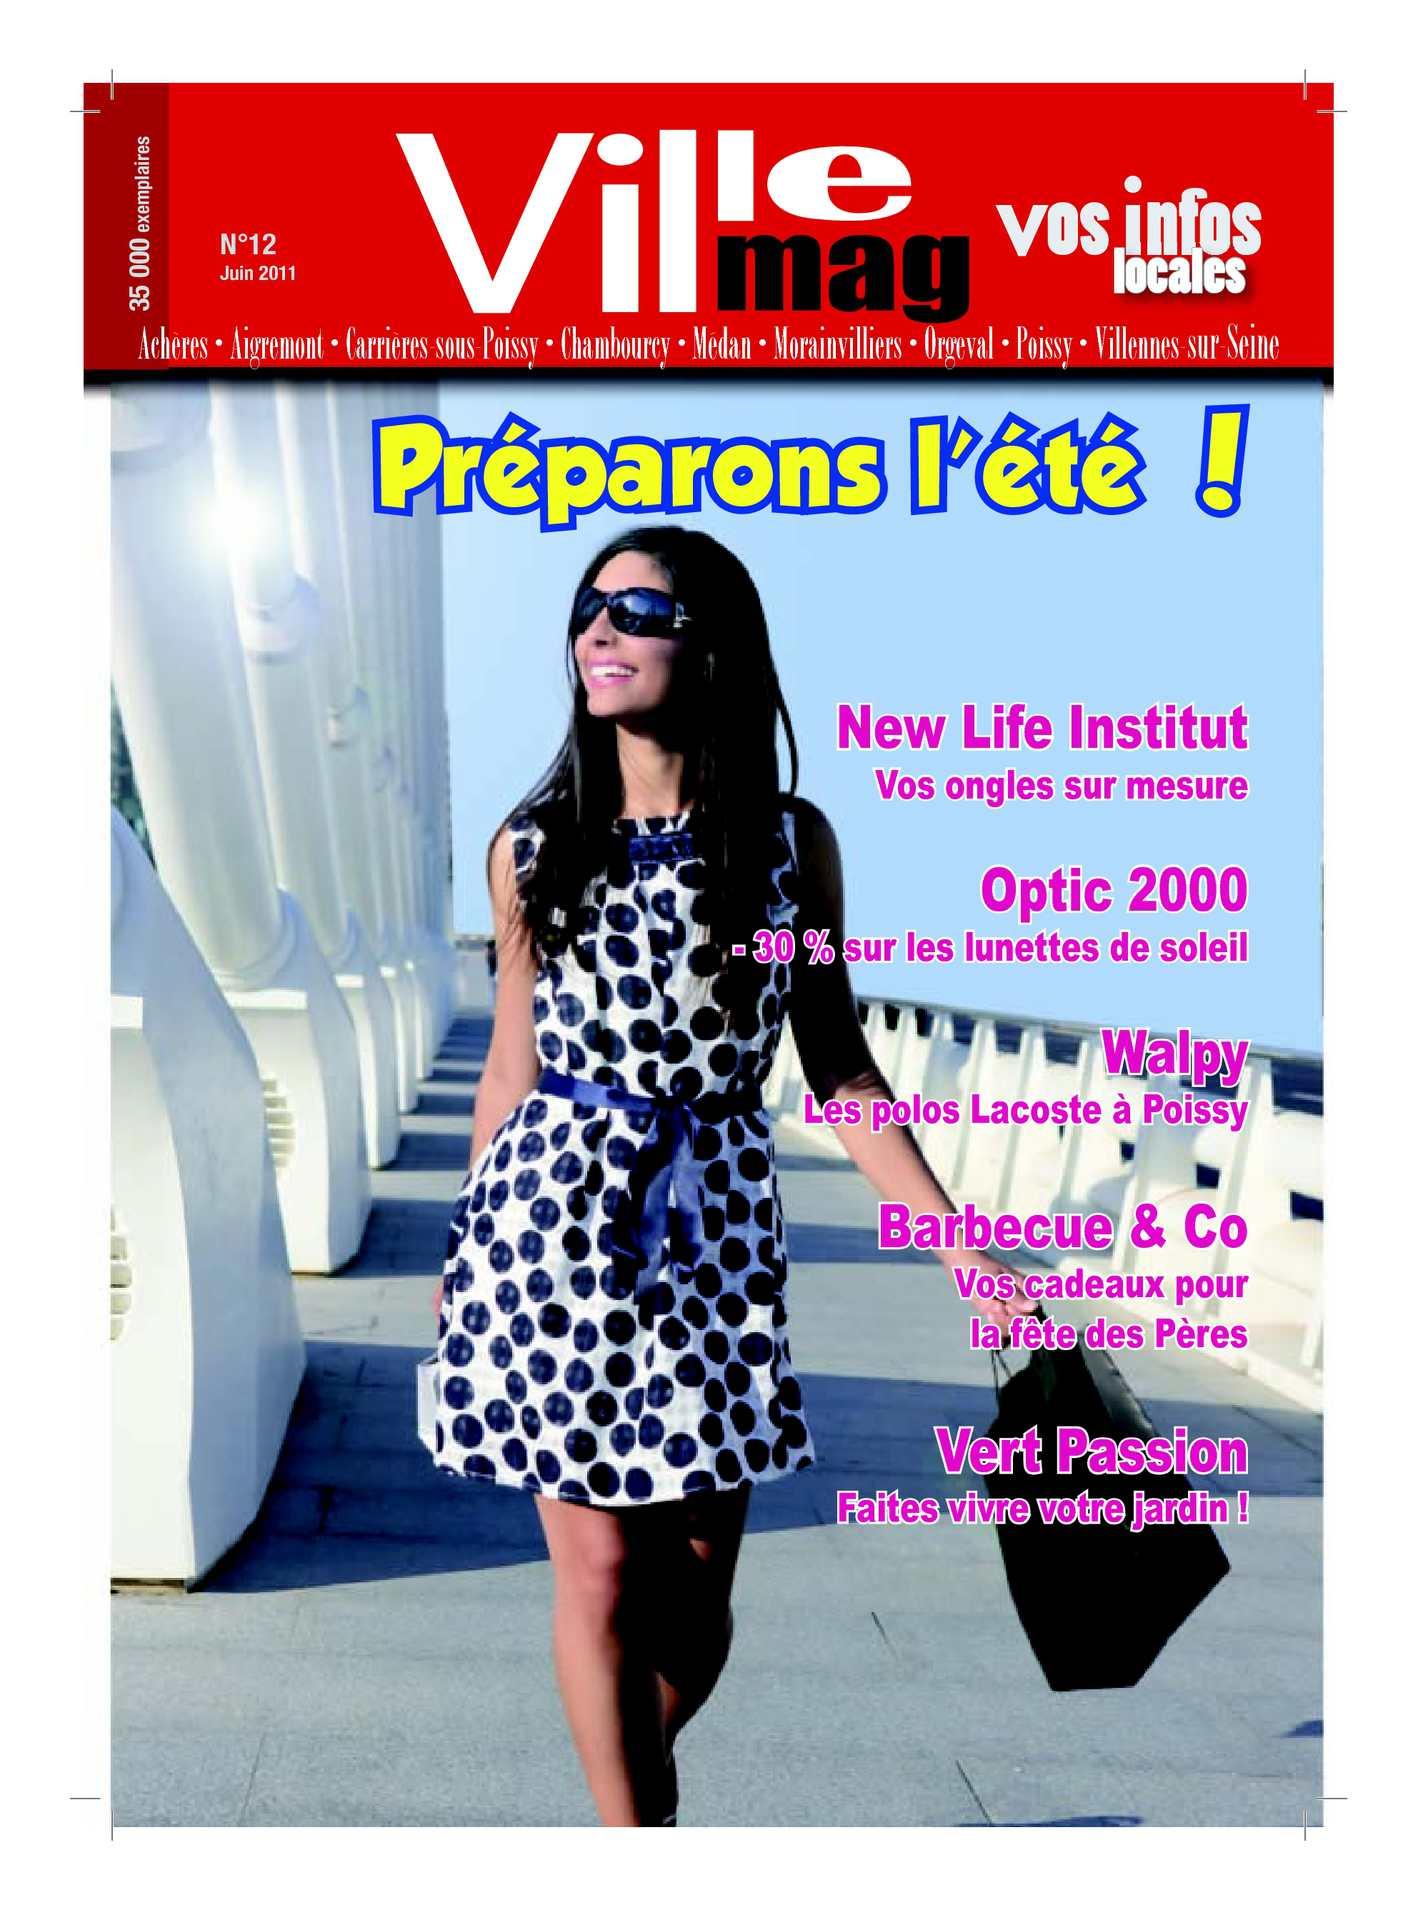 0288fd1bec7 Calaméo -   12 magazine gratuit Villemag Vos Infos Locales juin 2011